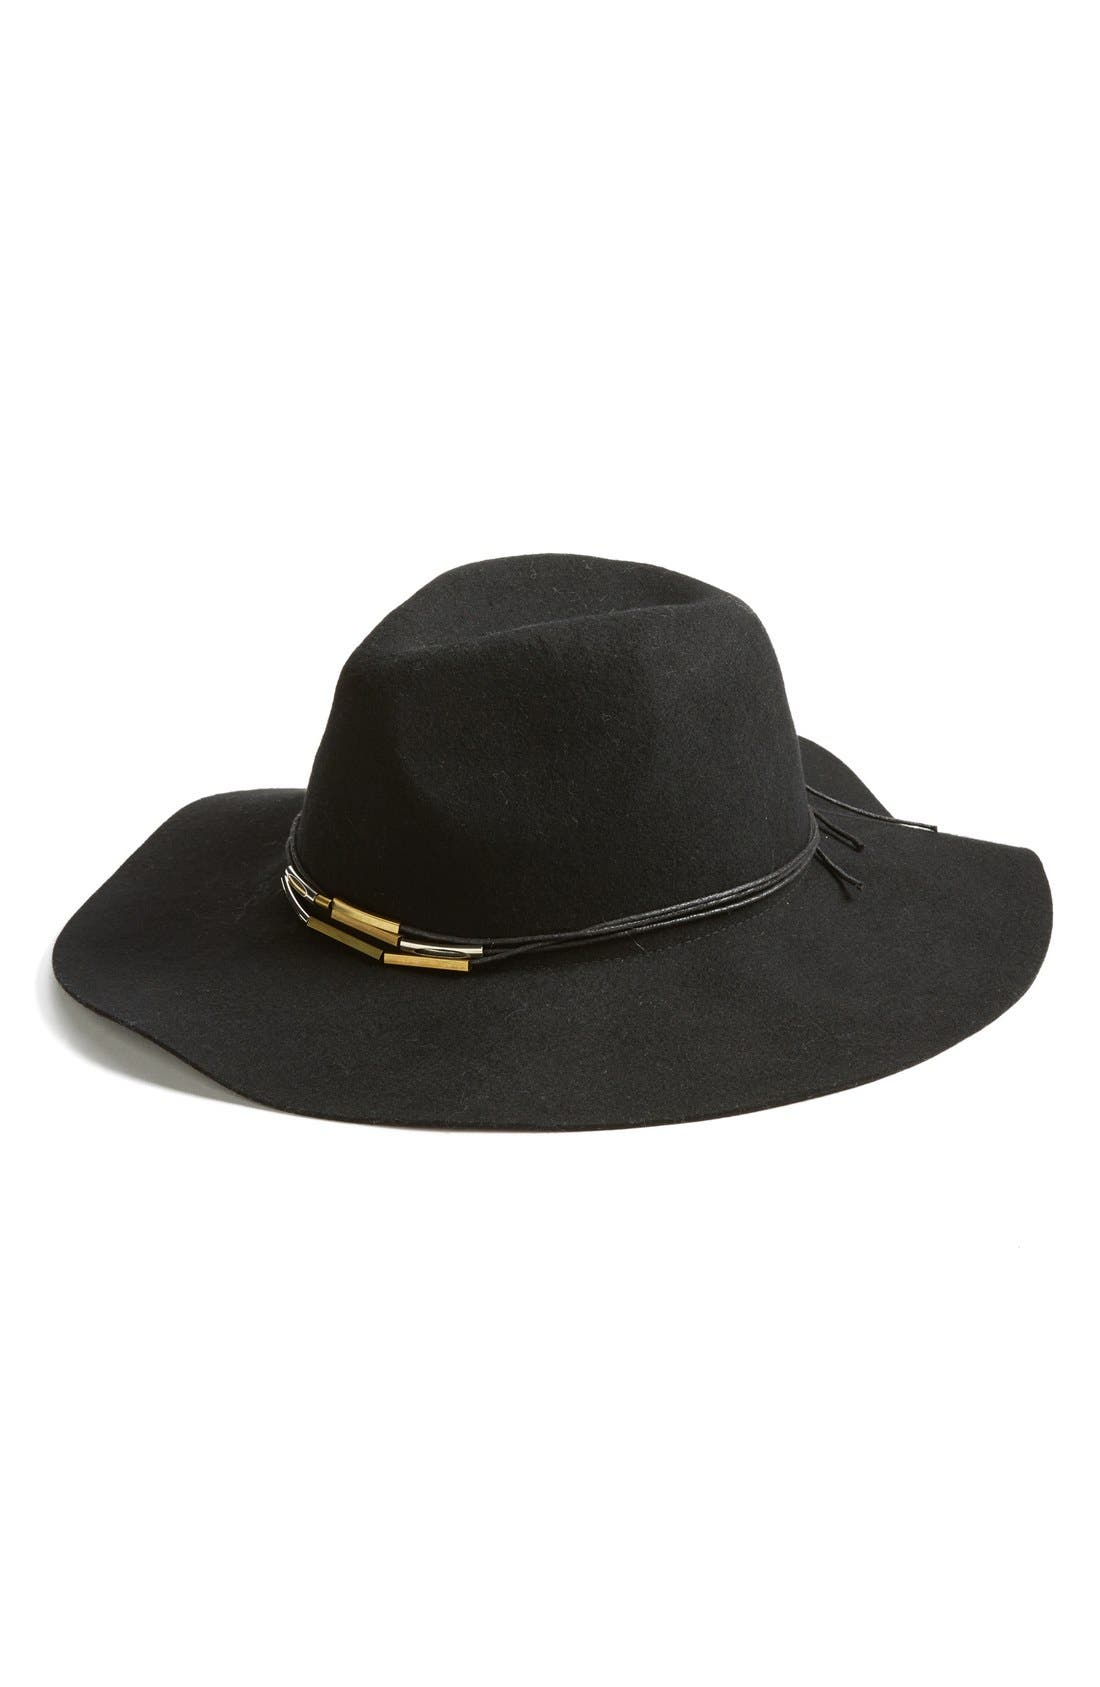 BP., Metal Bead Wool Felt Panama Hat, Main thumbnail 1, color, 001